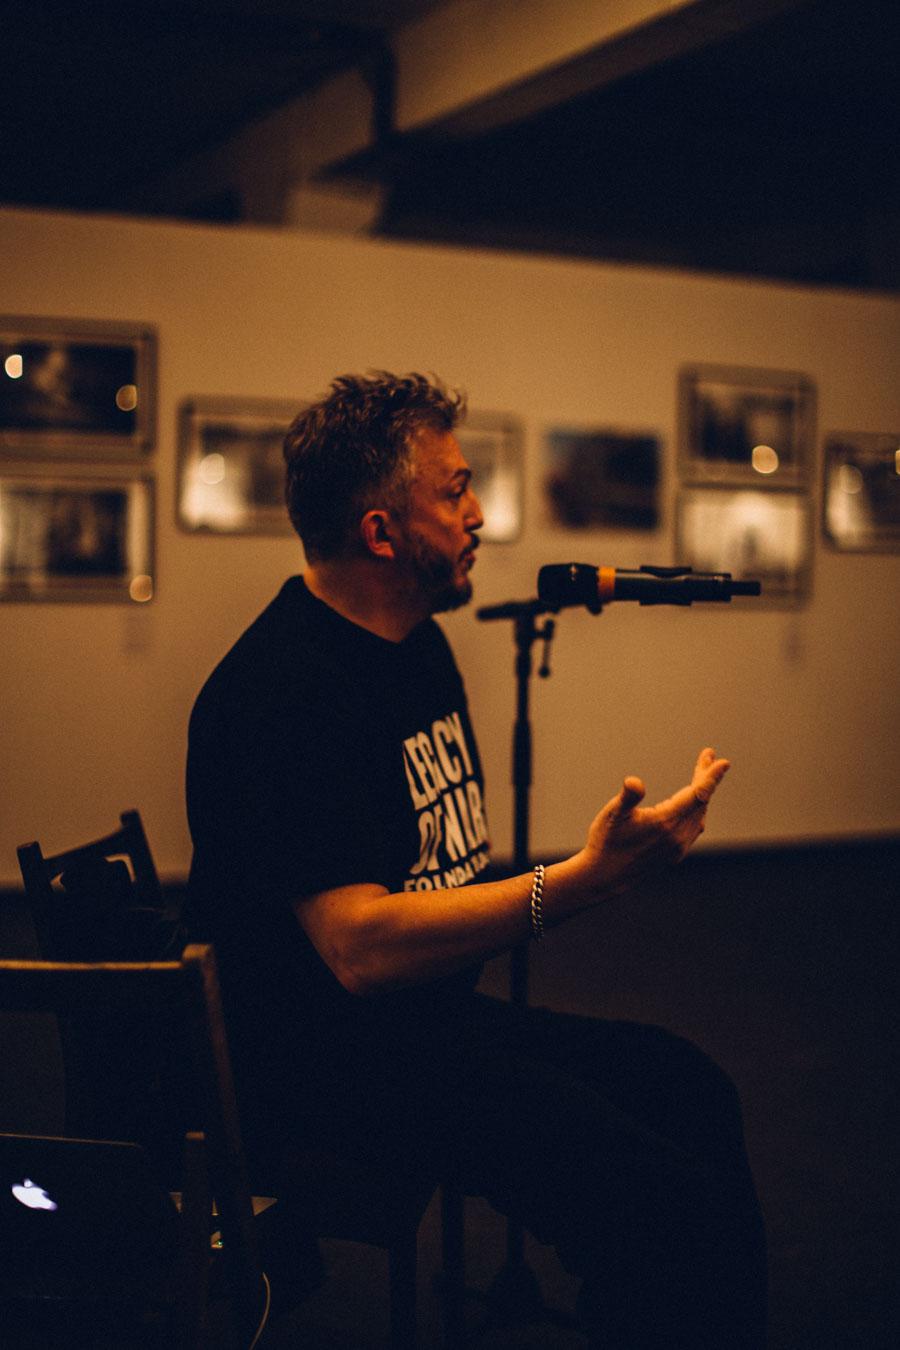 Giles Duley - Legacy of War Foundation